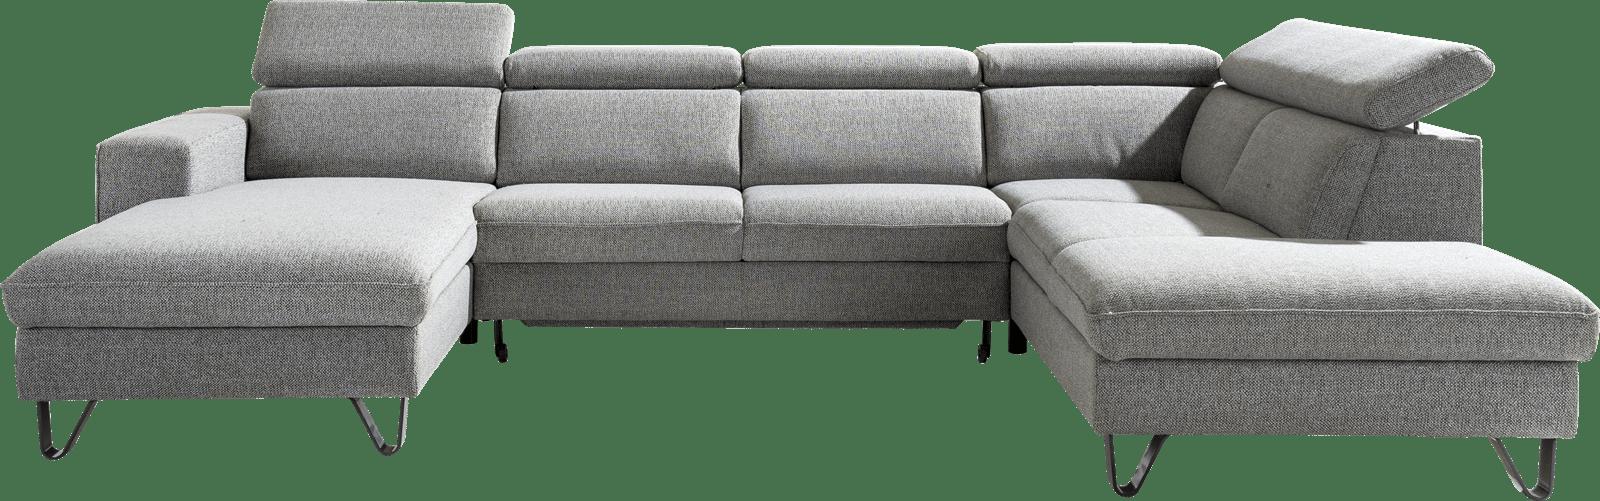 XOOON - Urban - Sofas - Longchair links - 3 Sitzer - Ottomane Rechts